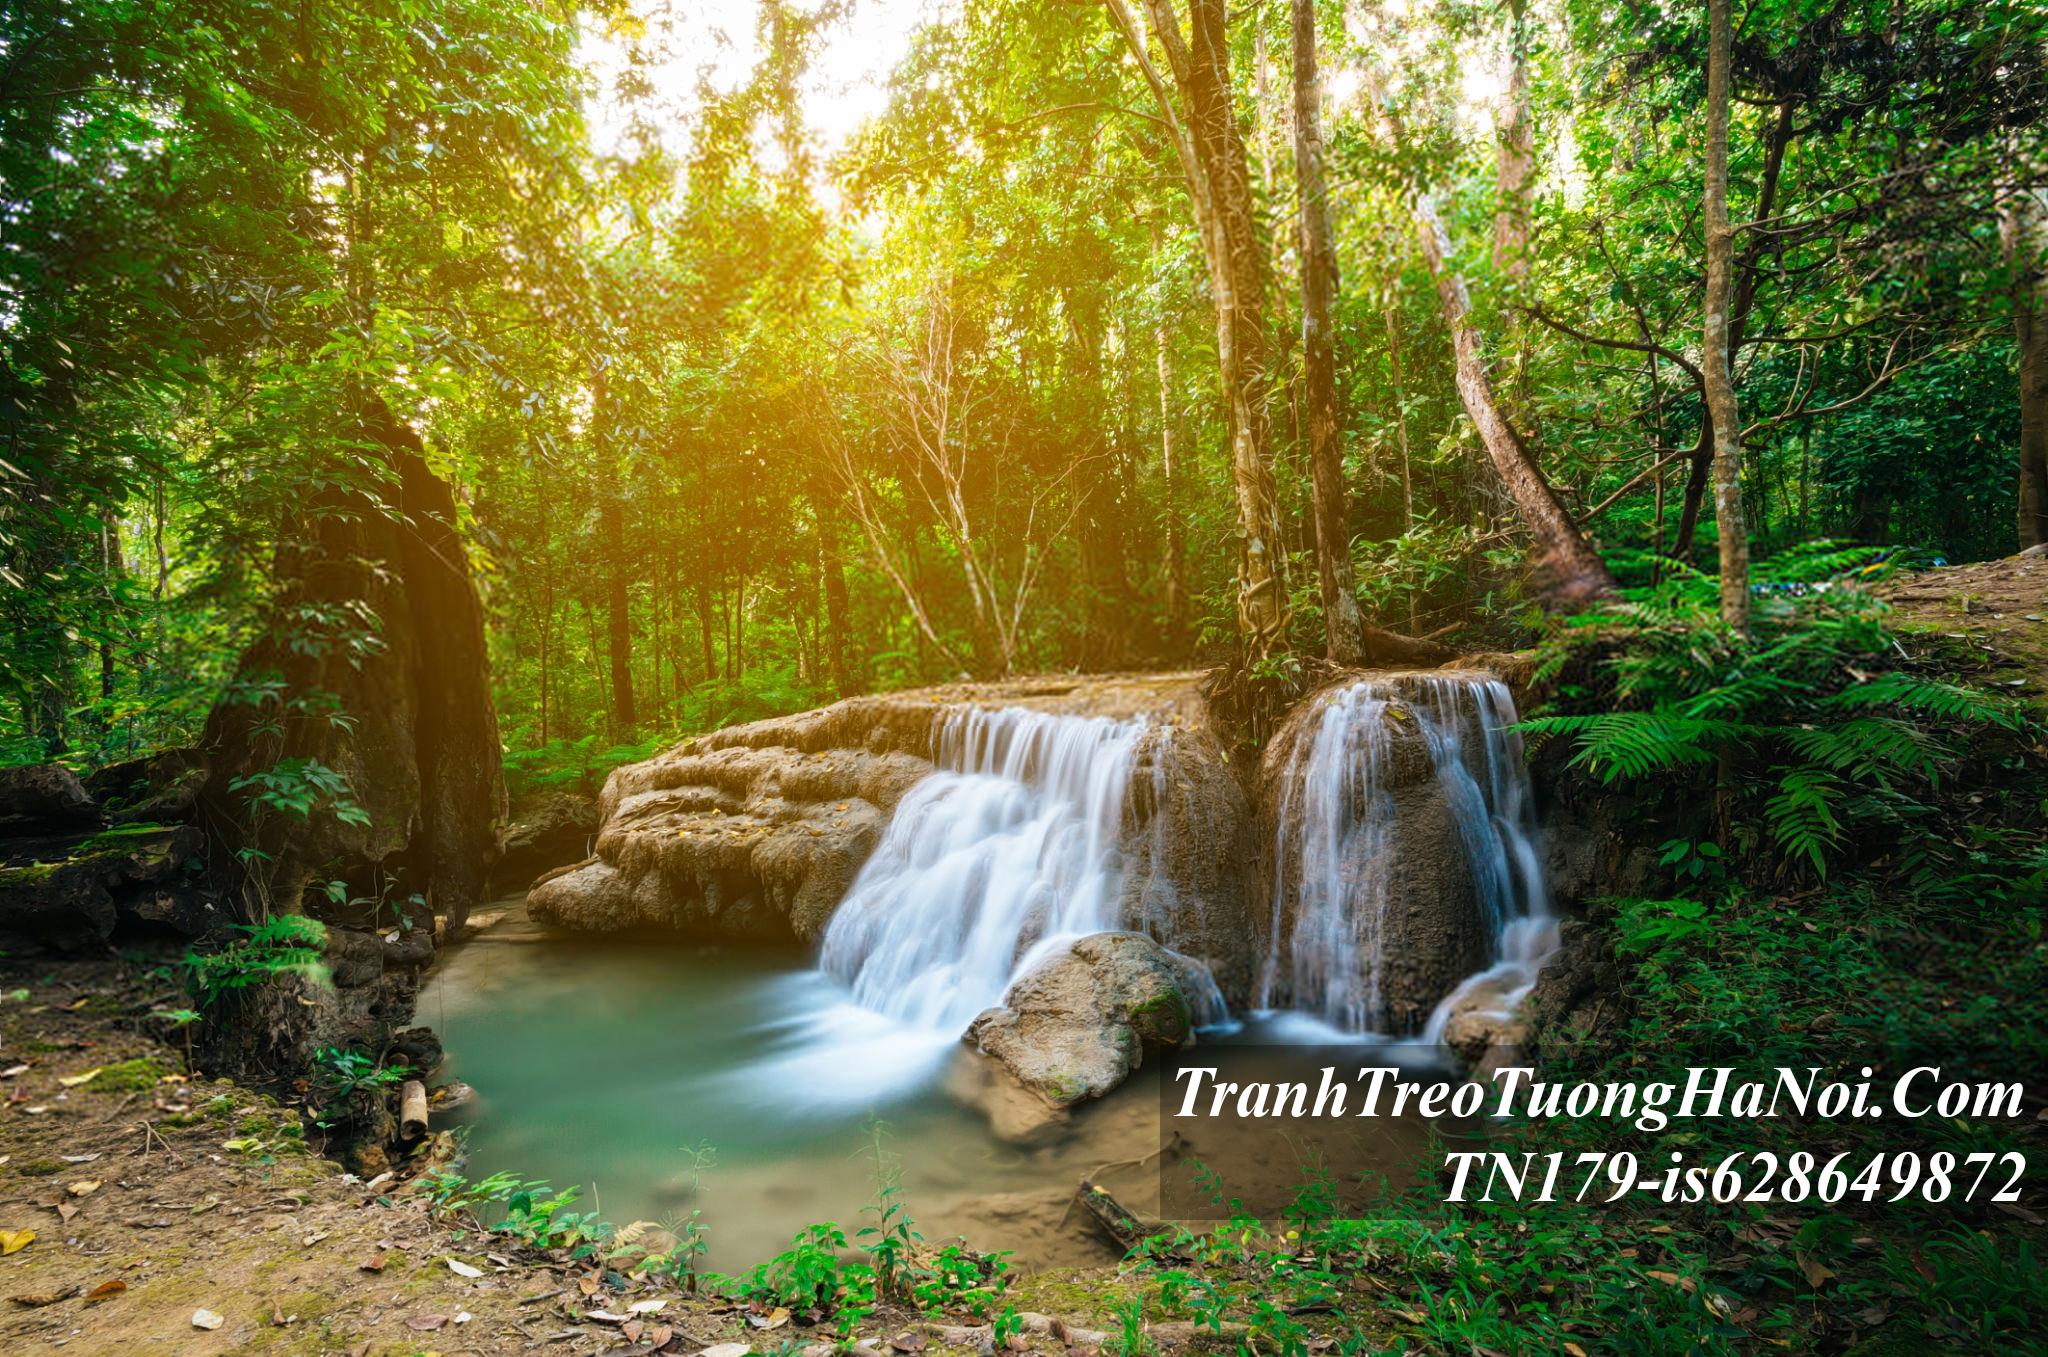 Thac nuoc chay thanh khe suoi o thai lan TN179-is628649872